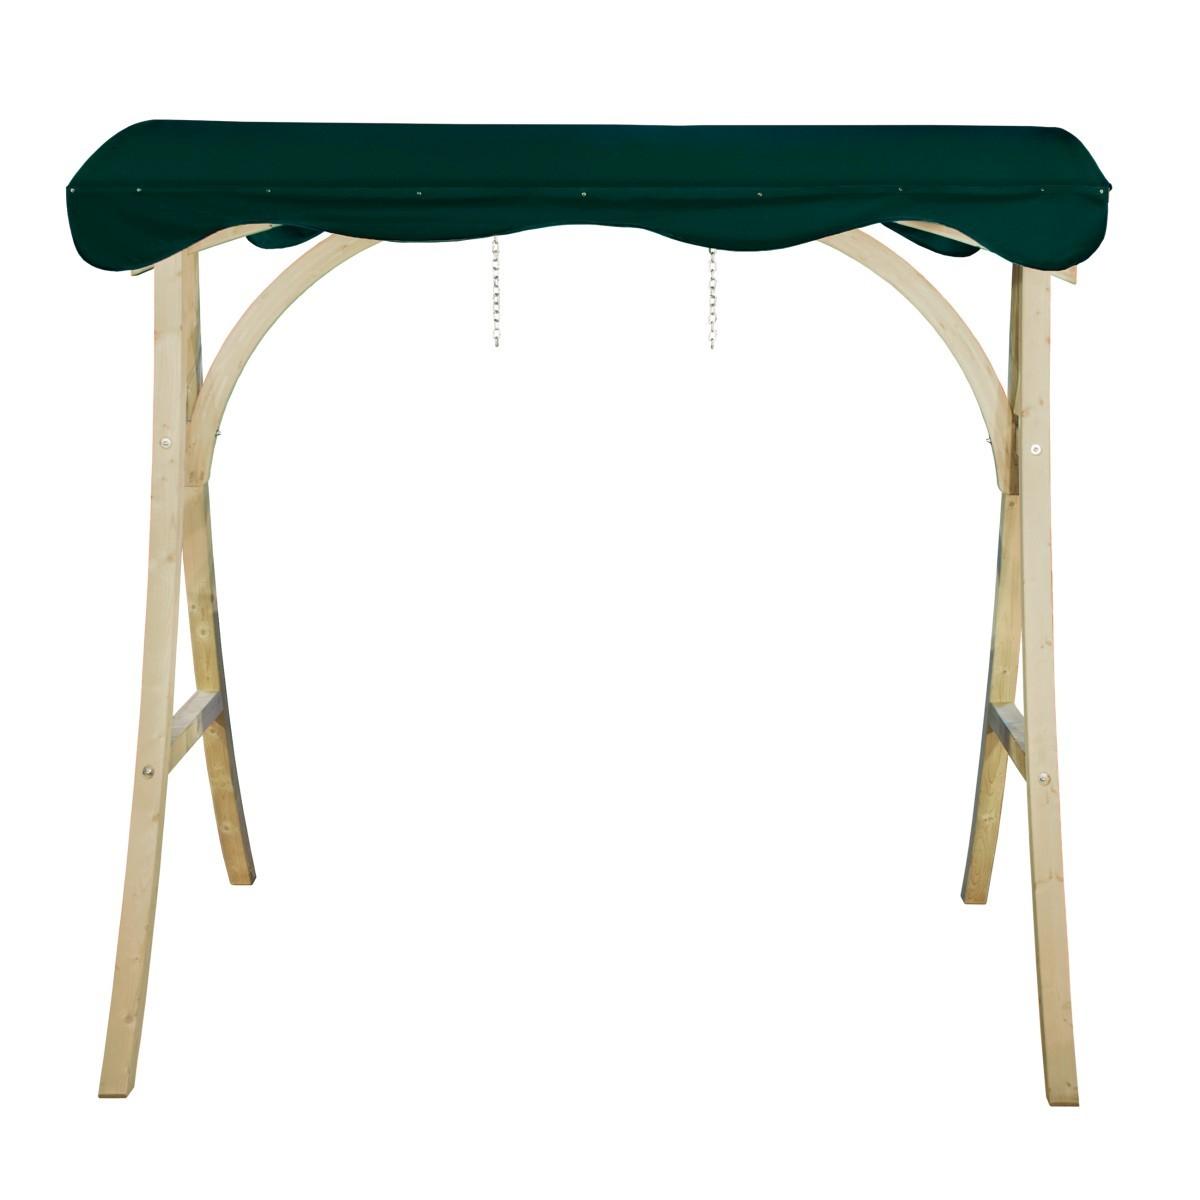 support fauteuil suspendu maison design. Black Bedroom Furniture Sets. Home Design Ideas